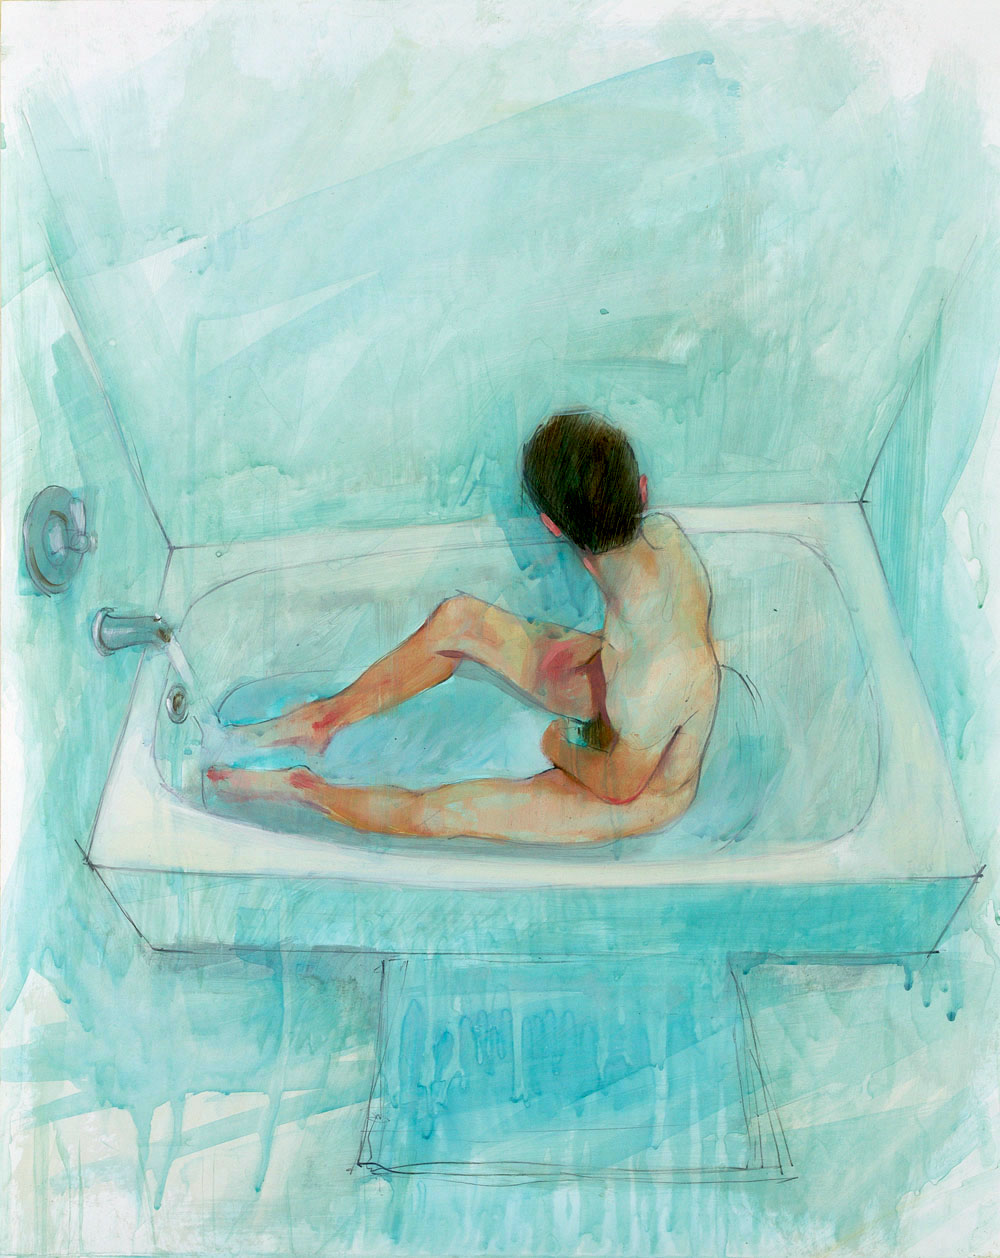 Bath Study No. 1   20 x 16 inches  oil on TerraSkin - SOLD